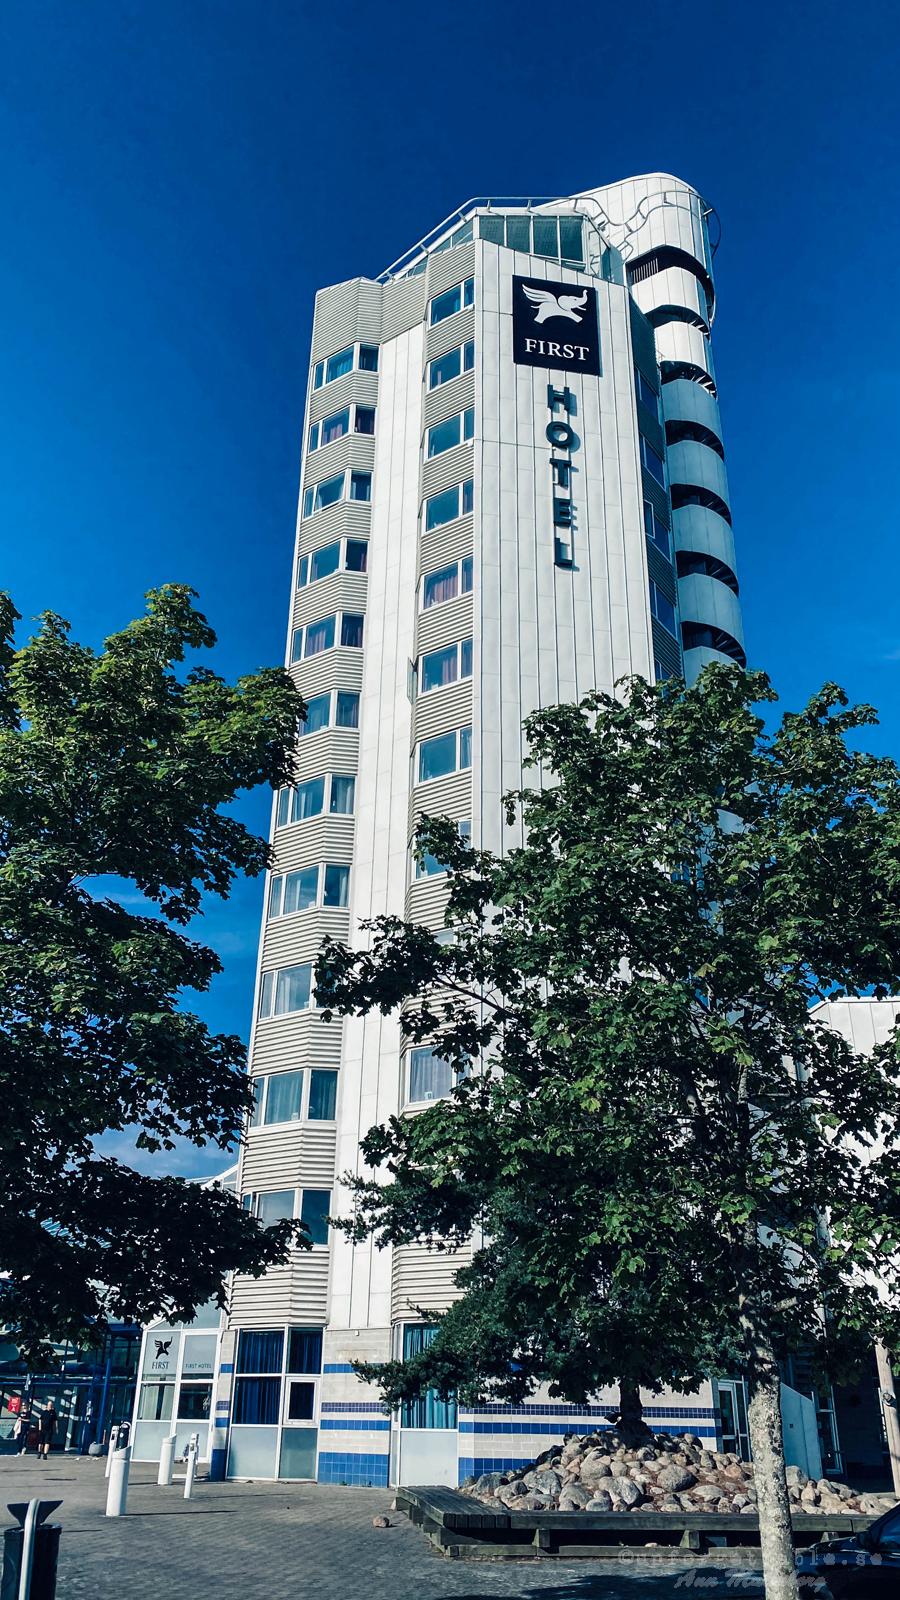 First hotell Jönköping